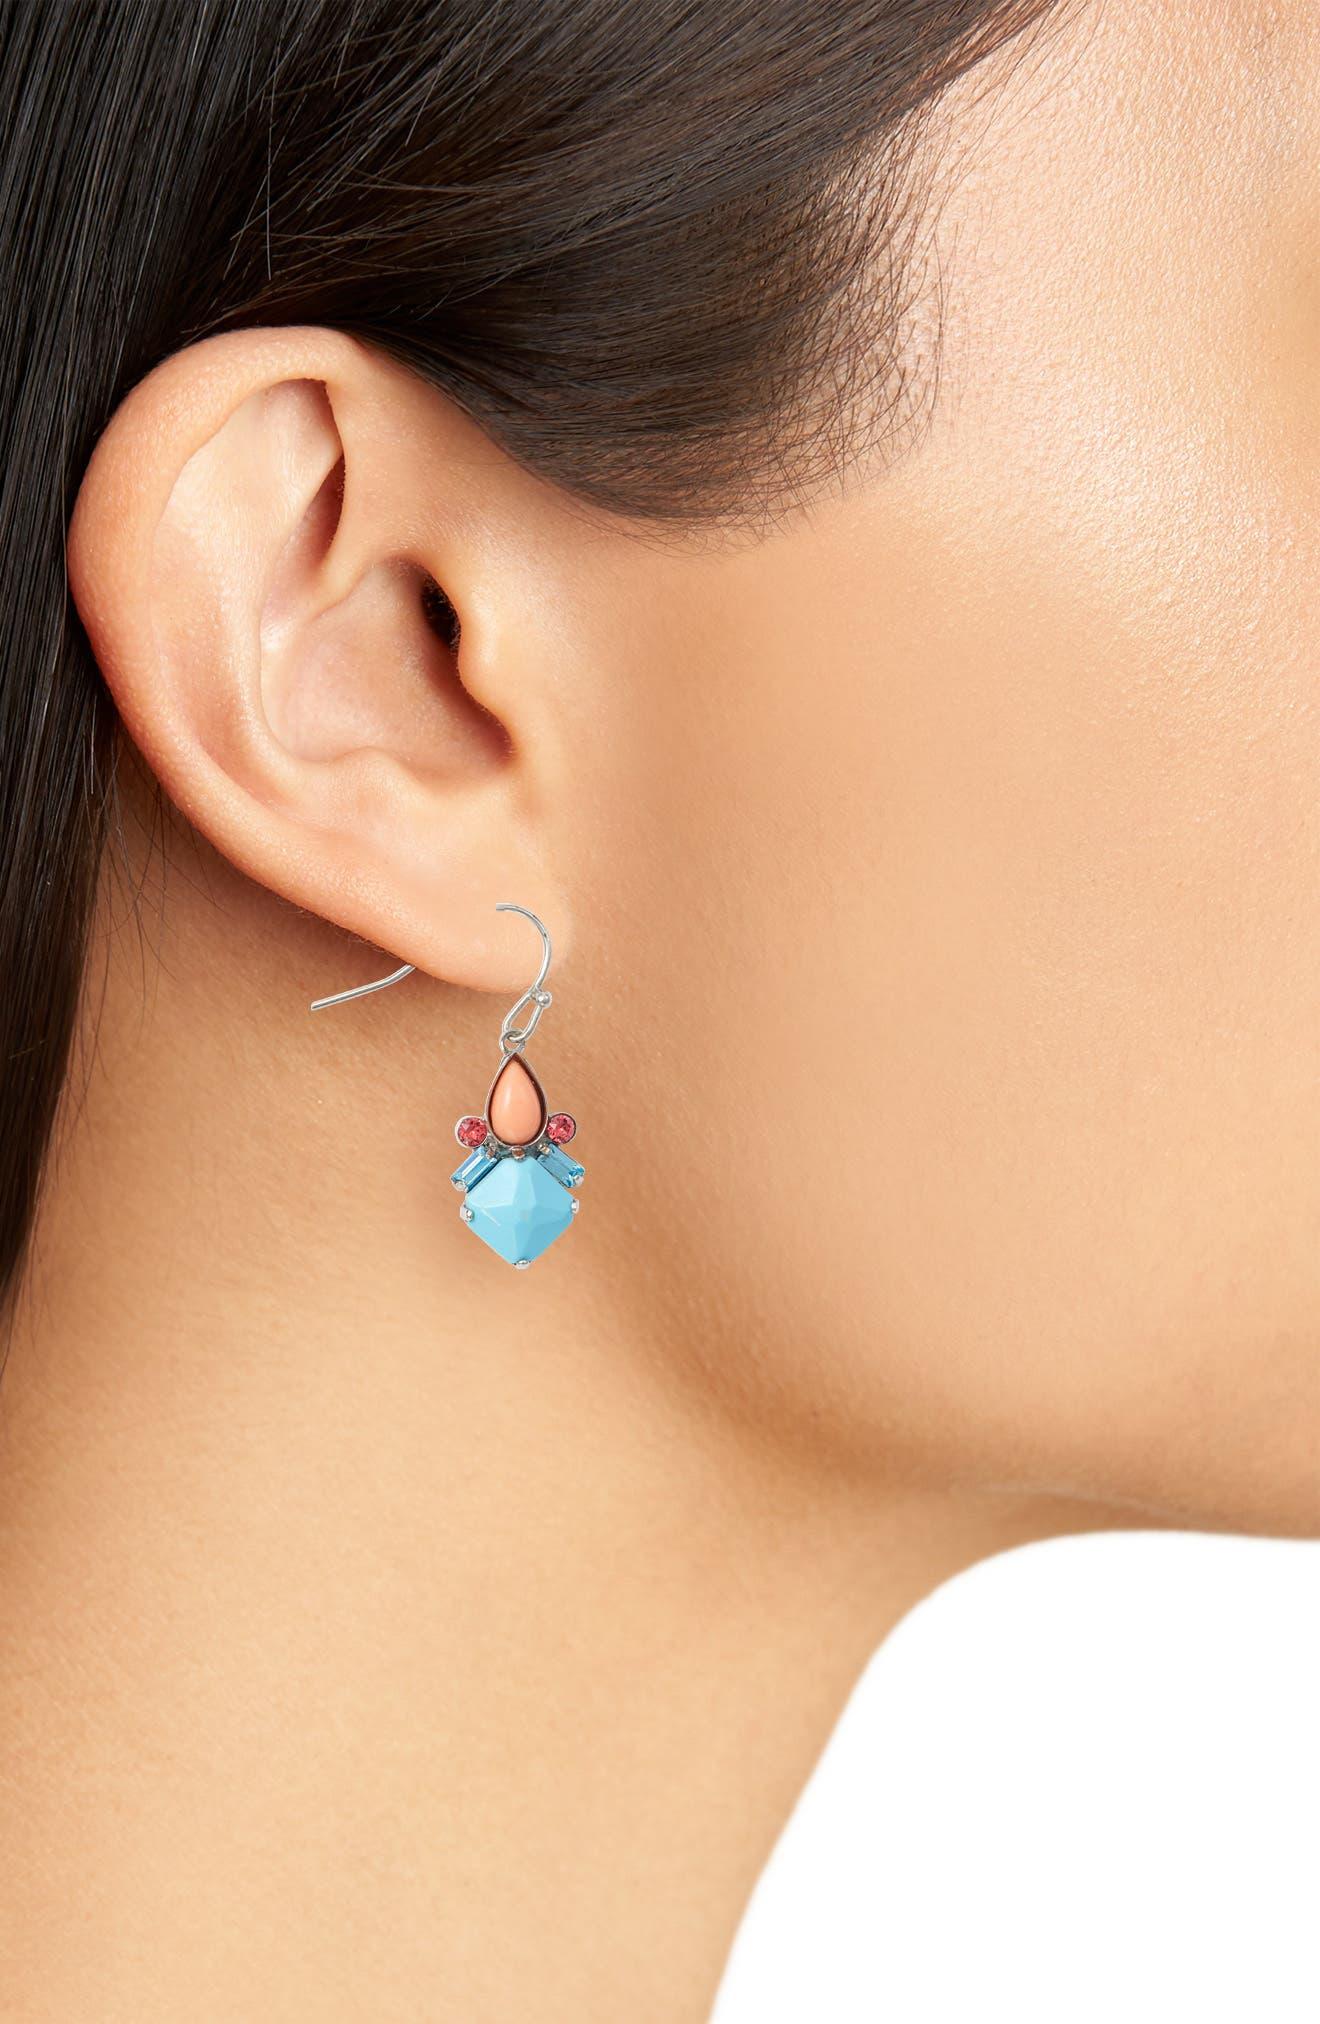 Cassia Earrings,                             Alternate thumbnail 2, color,                             400